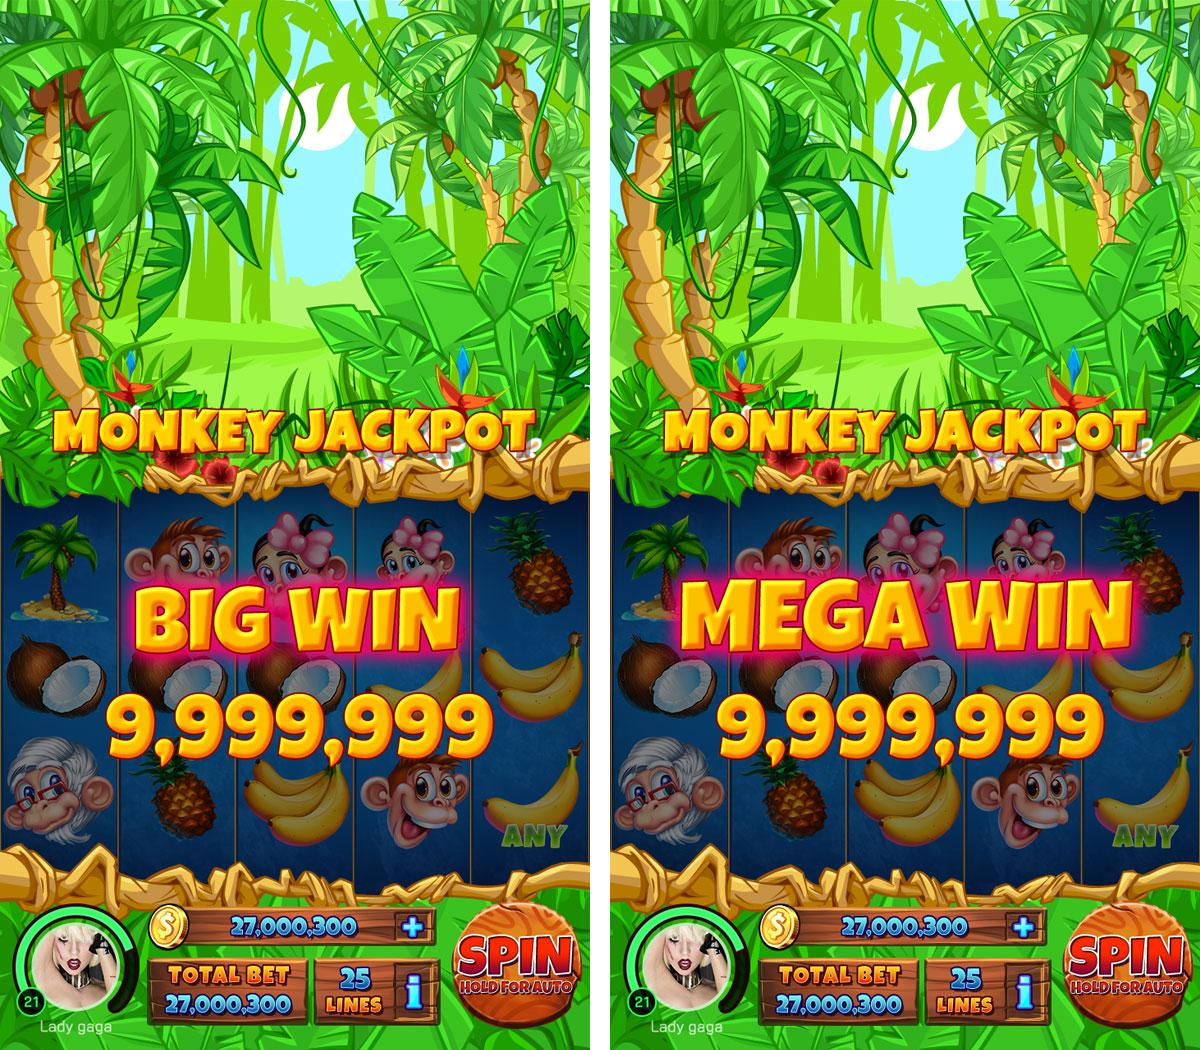 monkey_jackpot_blog_win-2